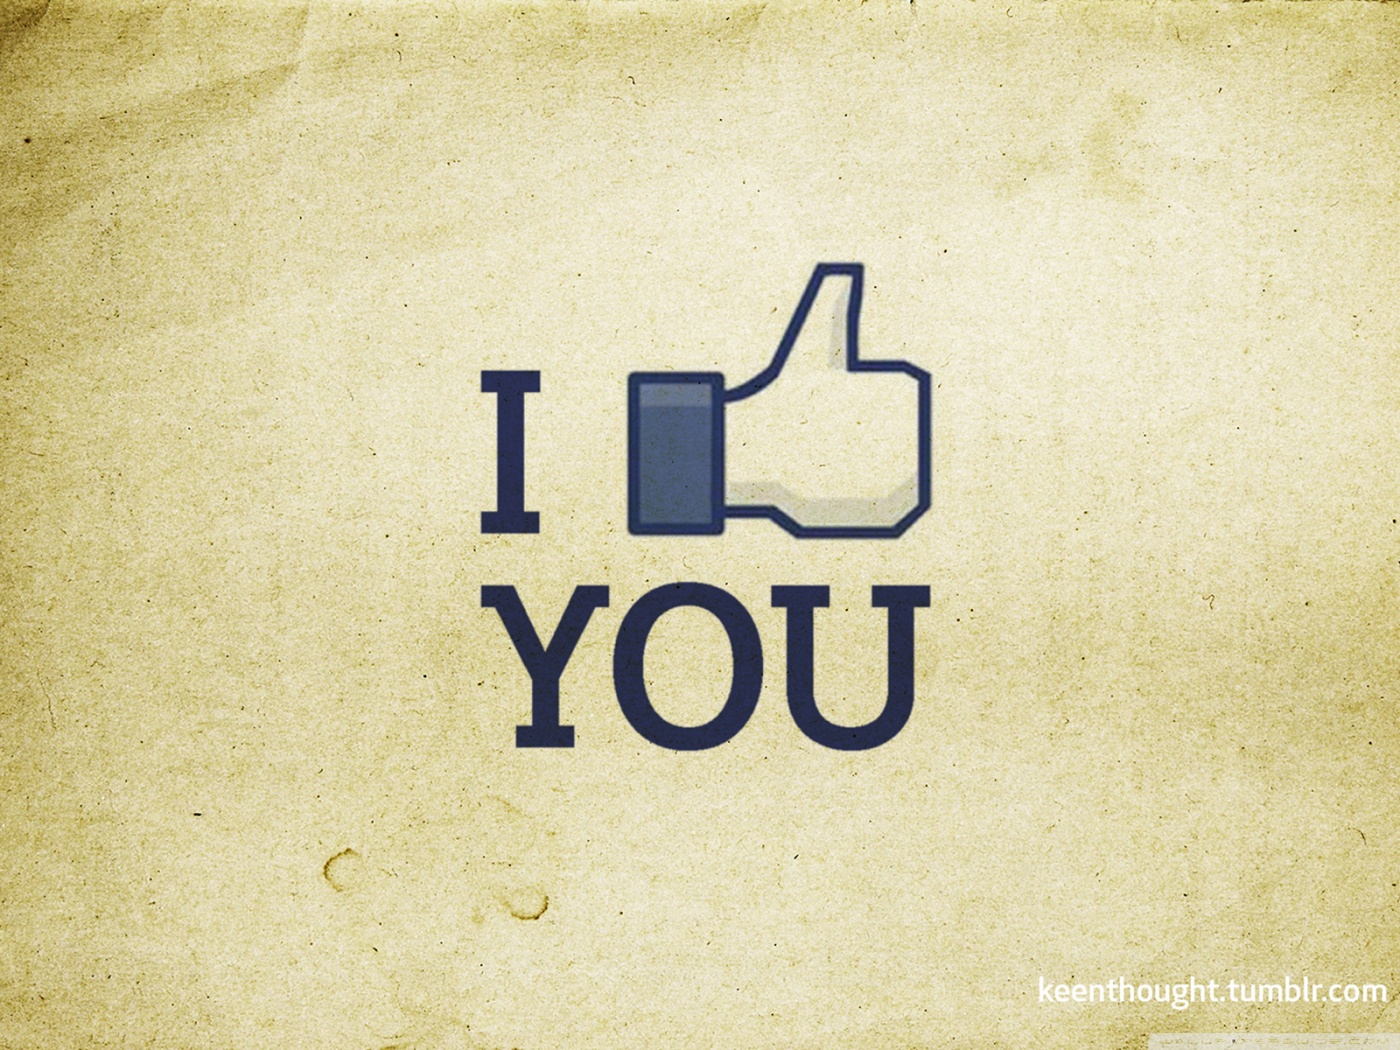 http://1.bp.blogspot.com/-pWFXshwZi5w/URSs0ZxK65I/AAAAAAAAAW8/rRW2kTvAKjI/s1600/i_like_you-wallpaper-1400x1050.jpg